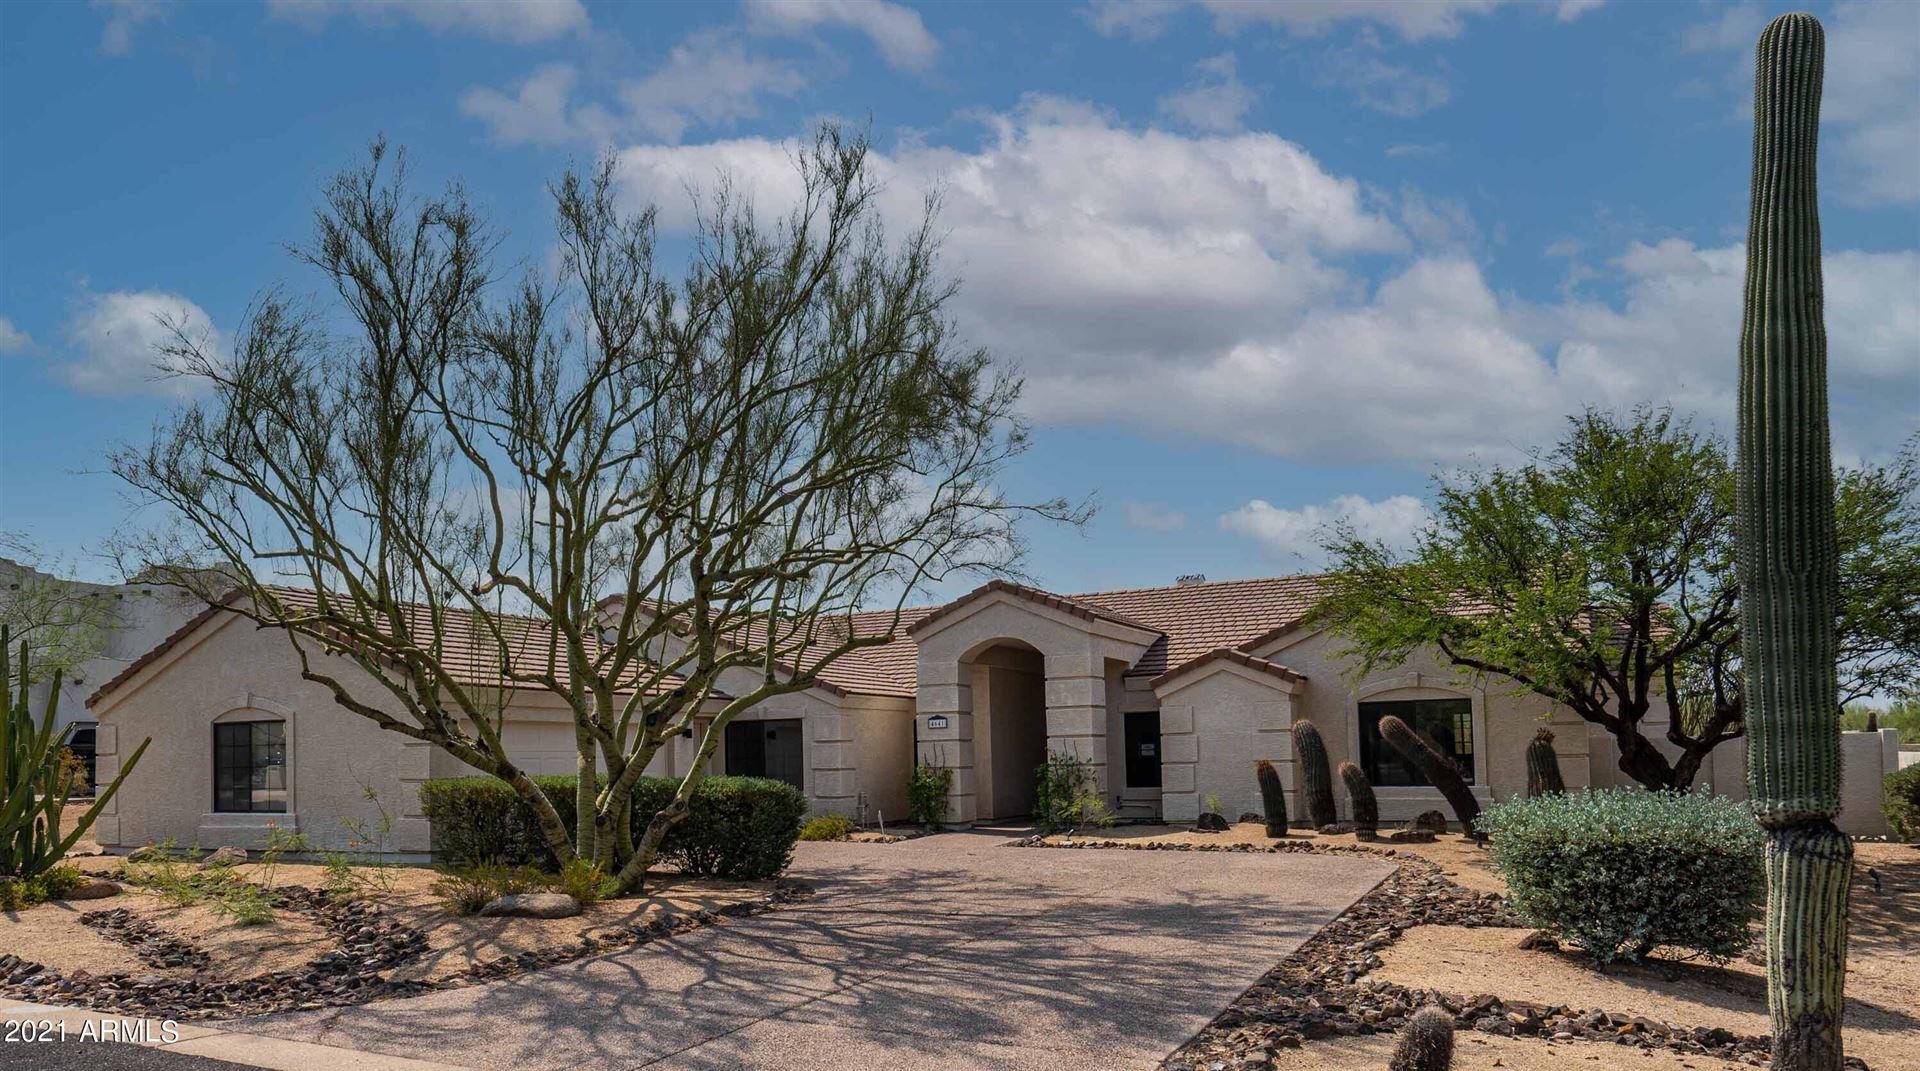 4641 E RANCHO CALIENTE Drive, Cave Creek, AZ 85331 - MLS#: 6264925